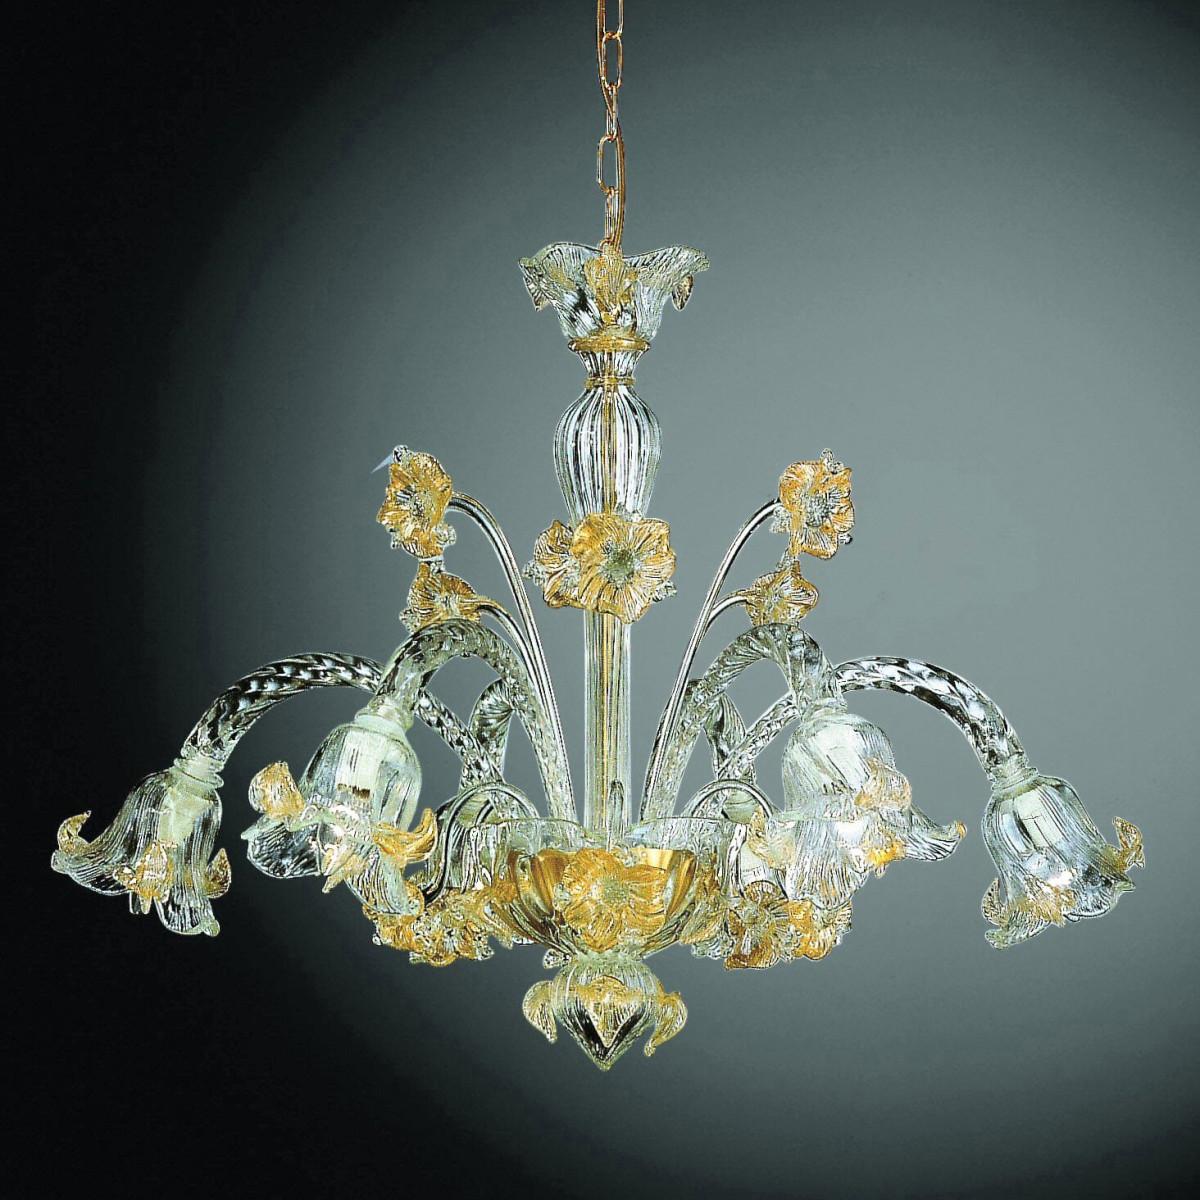 Flora 6 lights Murano chandelier - transparent gold color